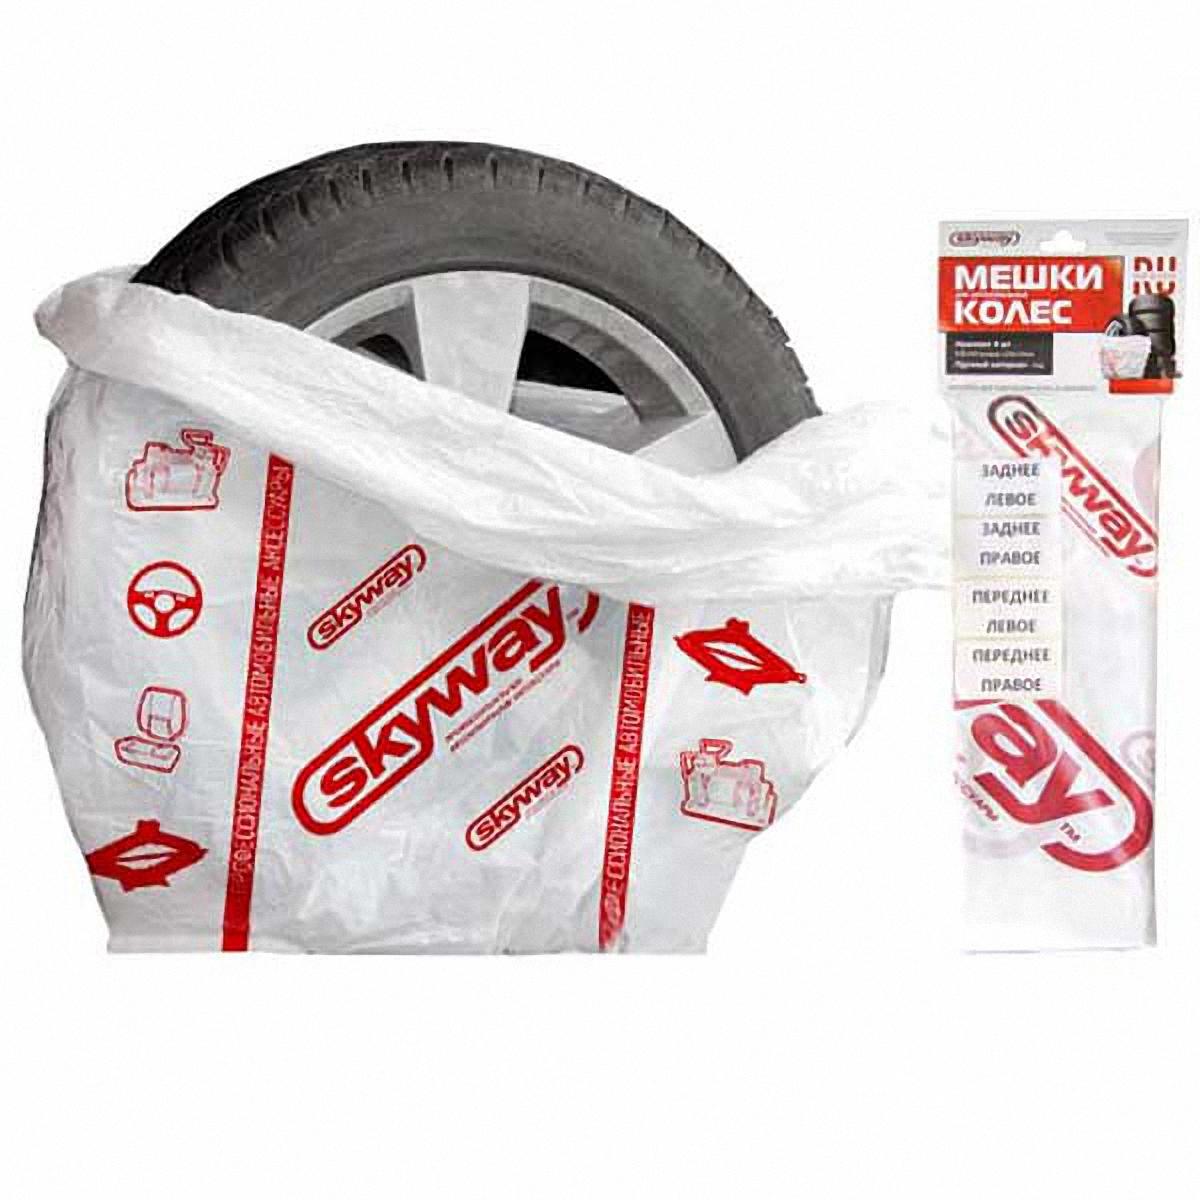 Мешки для колес Skyway